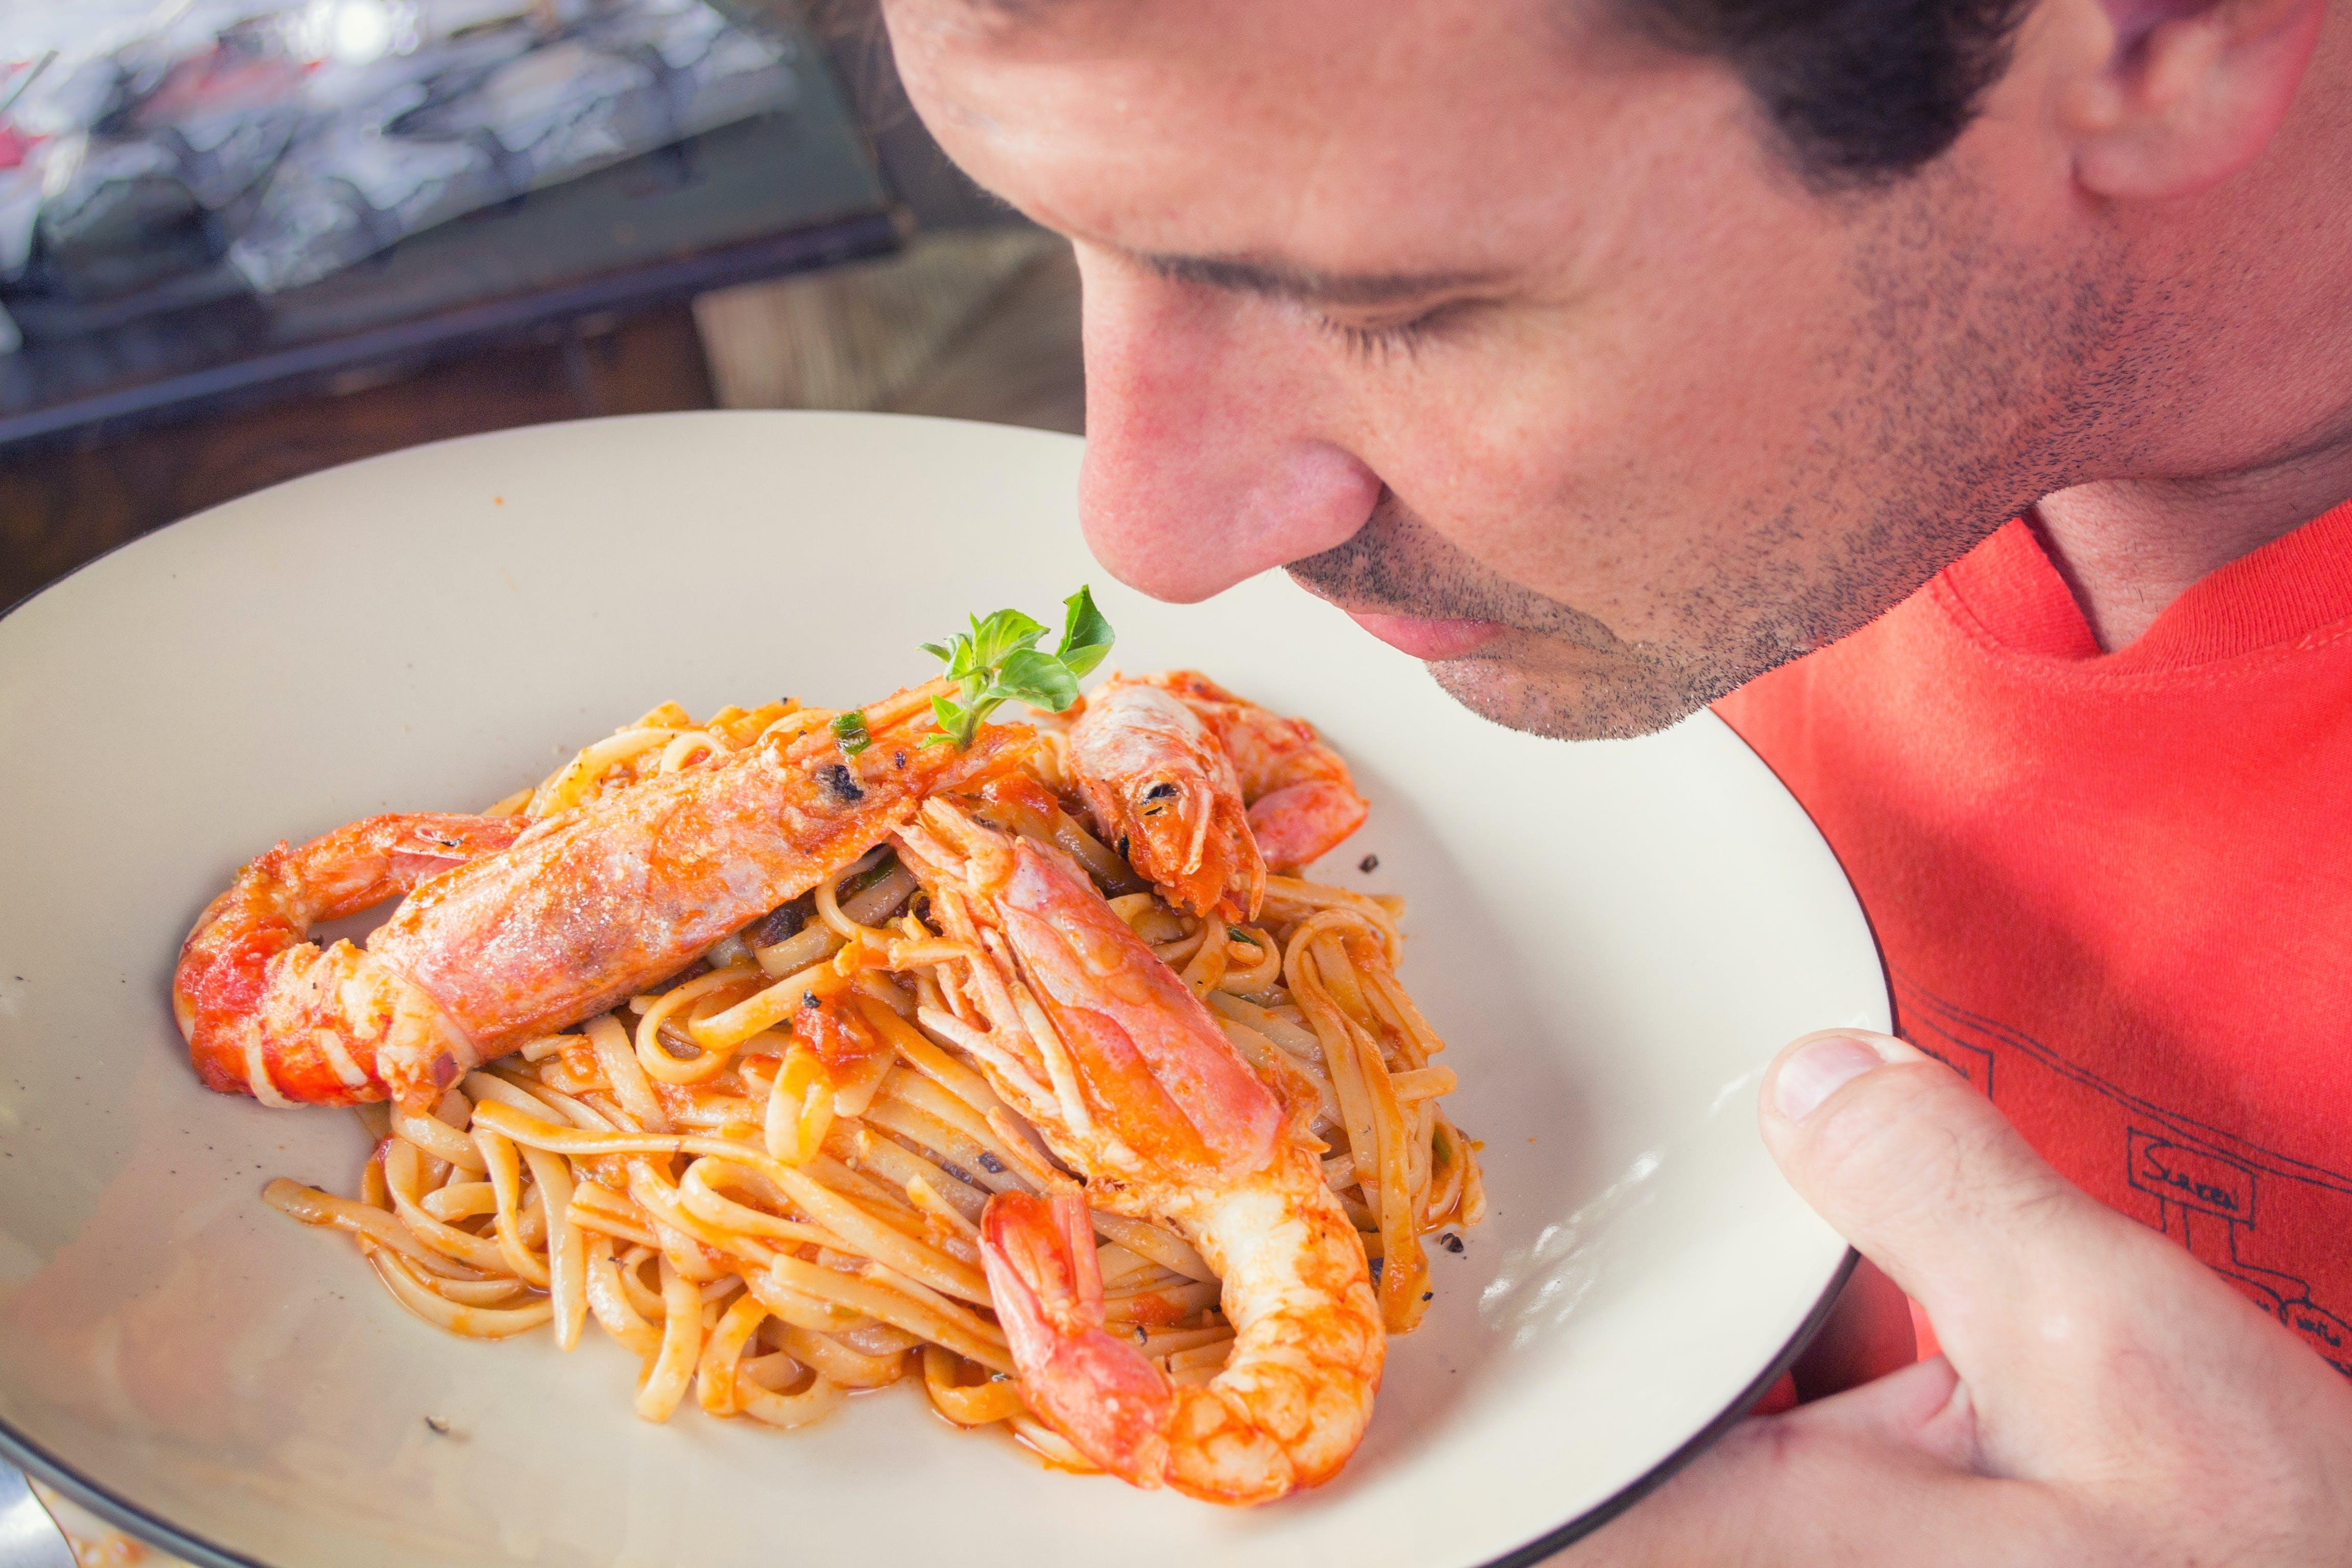 Man Smelling Prawn and Pasta Dish on White Ceramic Plate